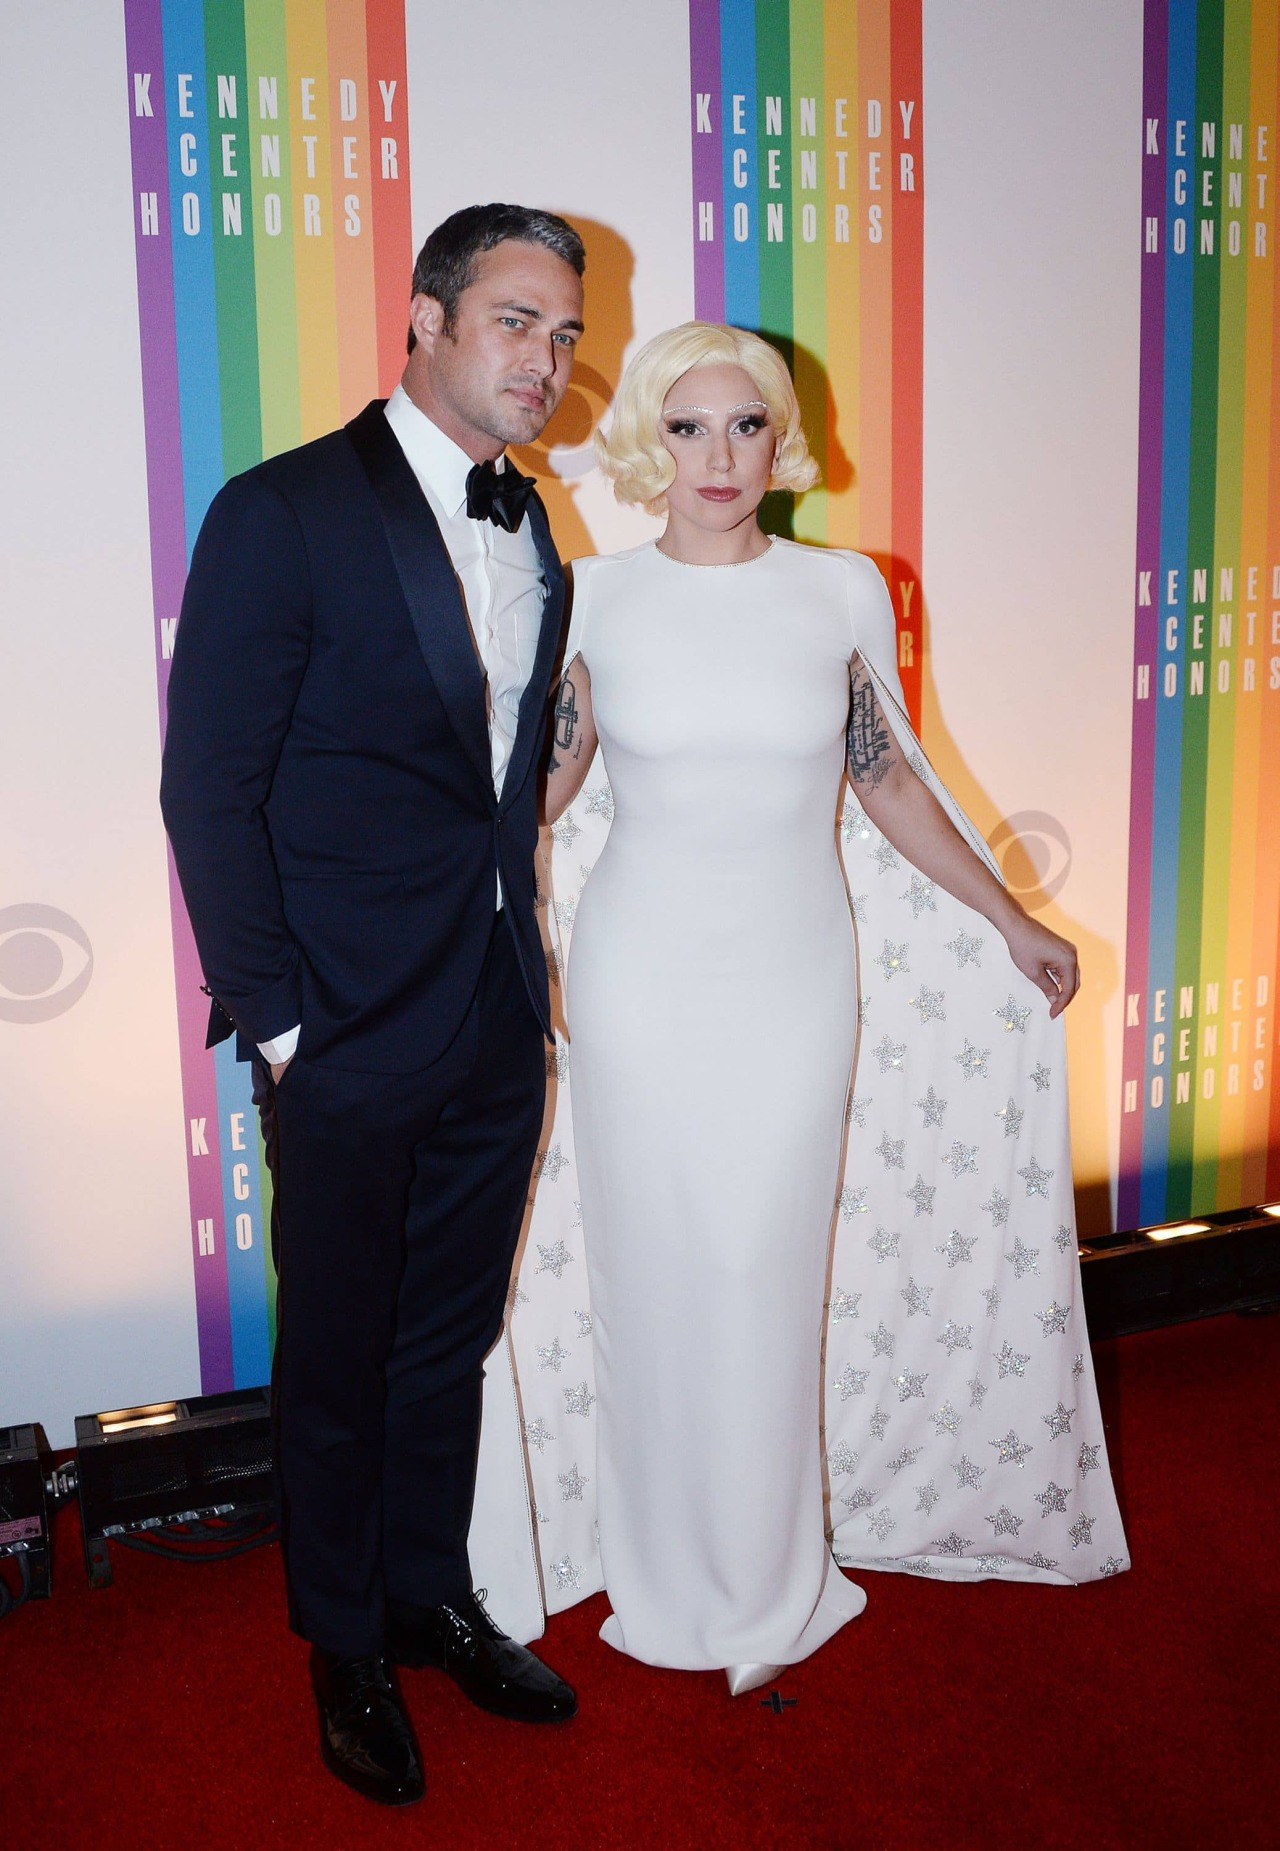 Lady Gaga and Taylor Kinney. - Page 2 Tumblr_ng9ie4VyYg1rz7rr7o2_1280